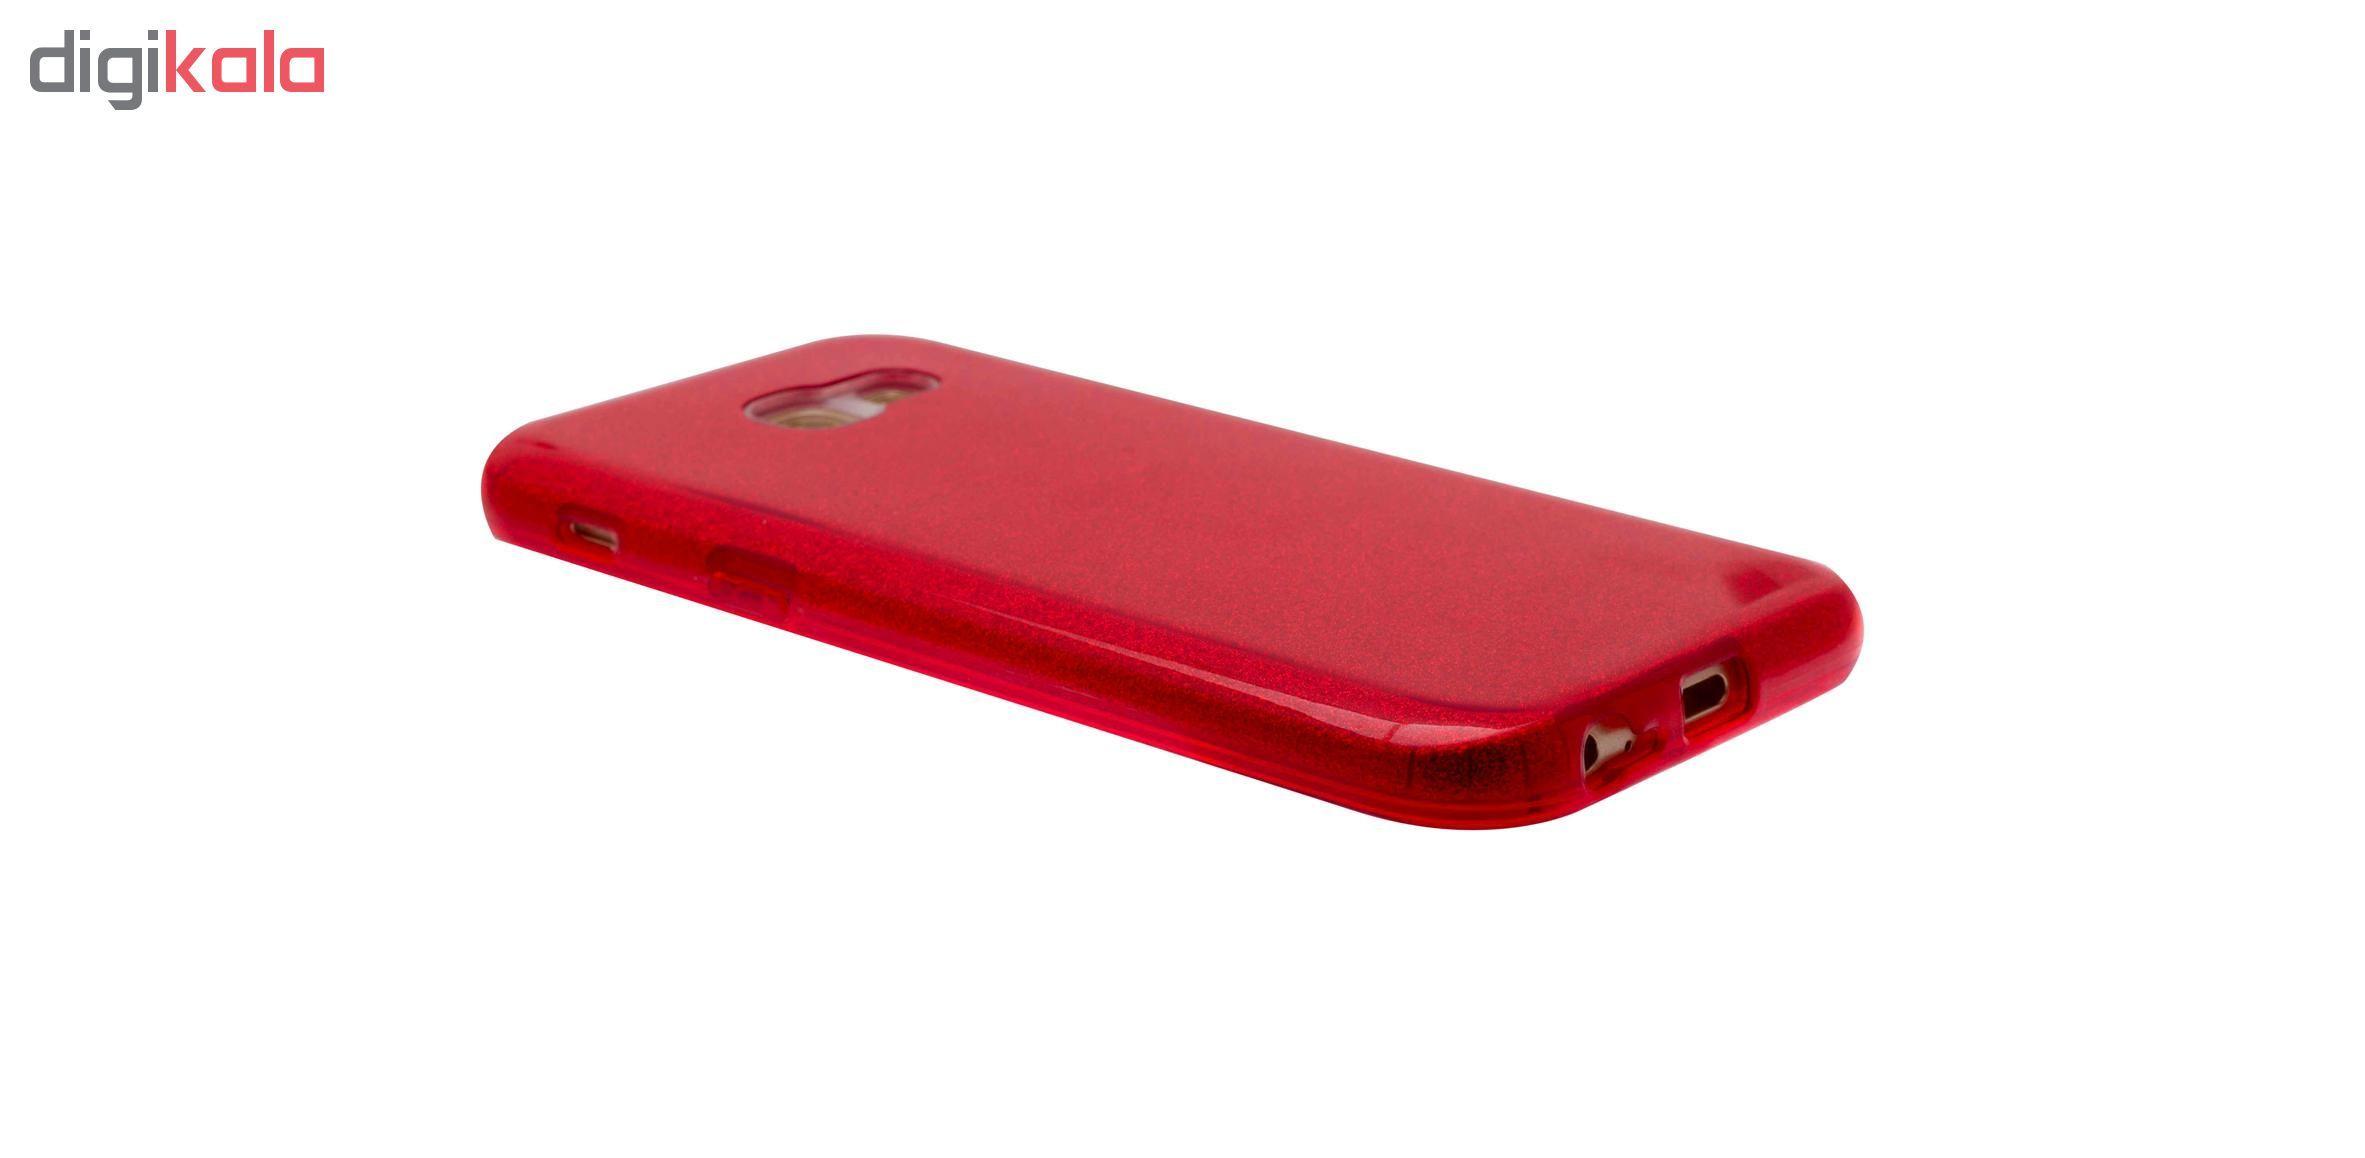 کاور مدل CORONA طرح اکلیلی مناسب برای گوشی سامسونگ گلکسی A5 2017 / A520 main 1 3